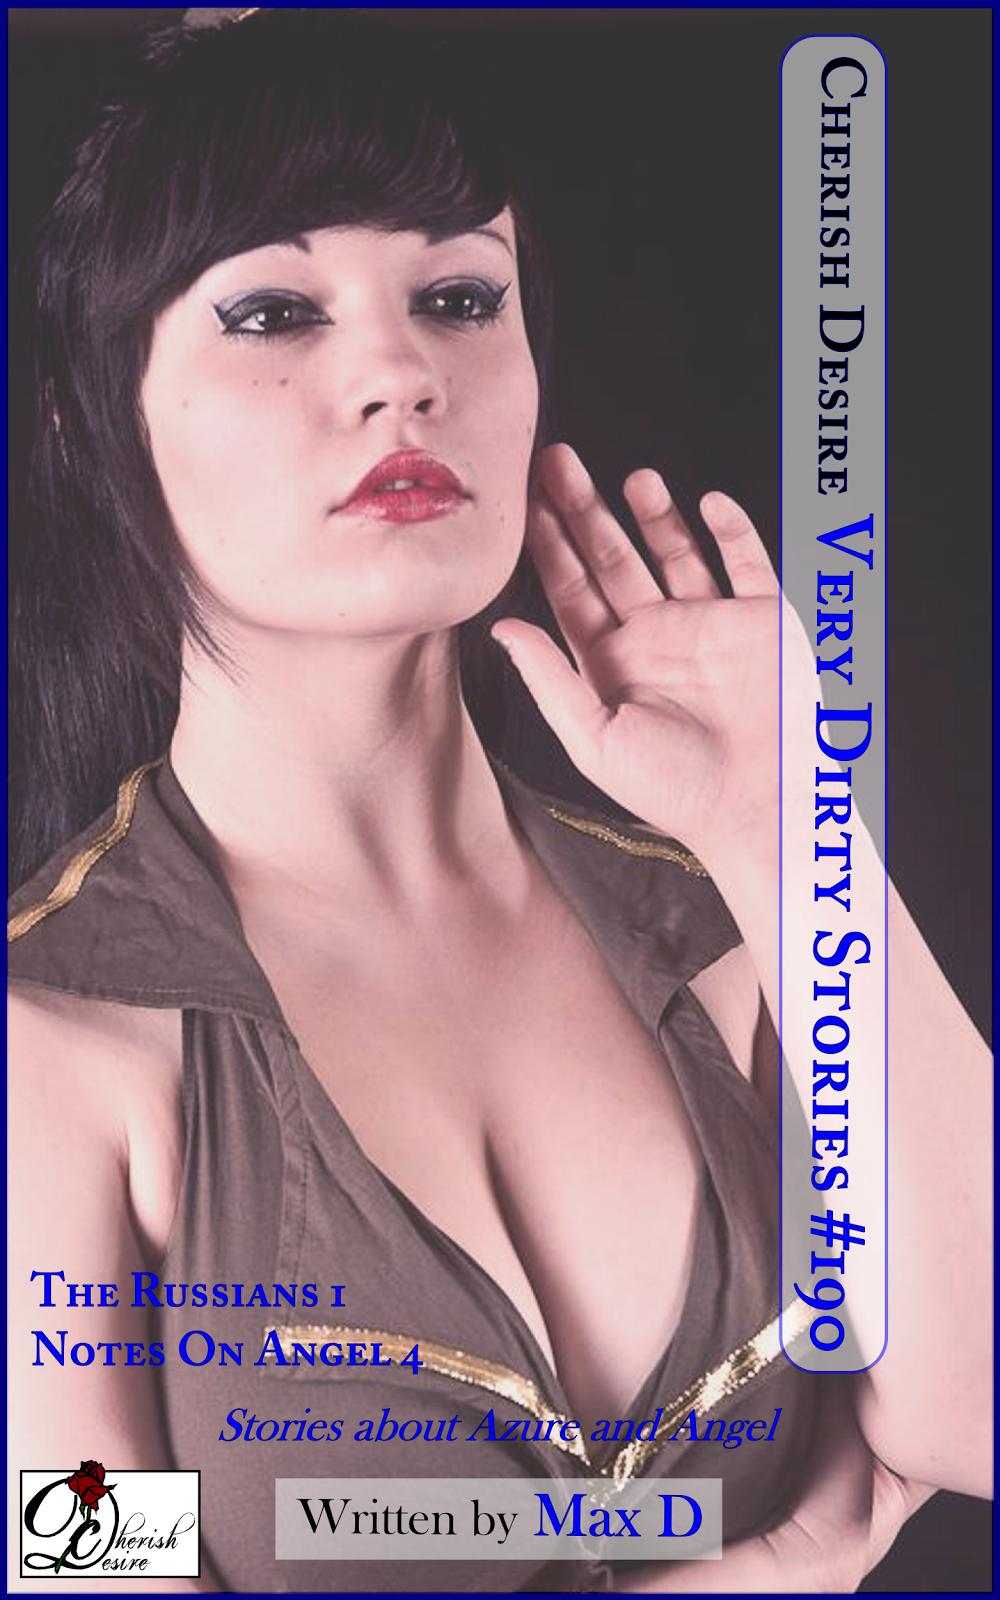 Cherish Desire: Very Dirty Stories #190, Max D, erotica